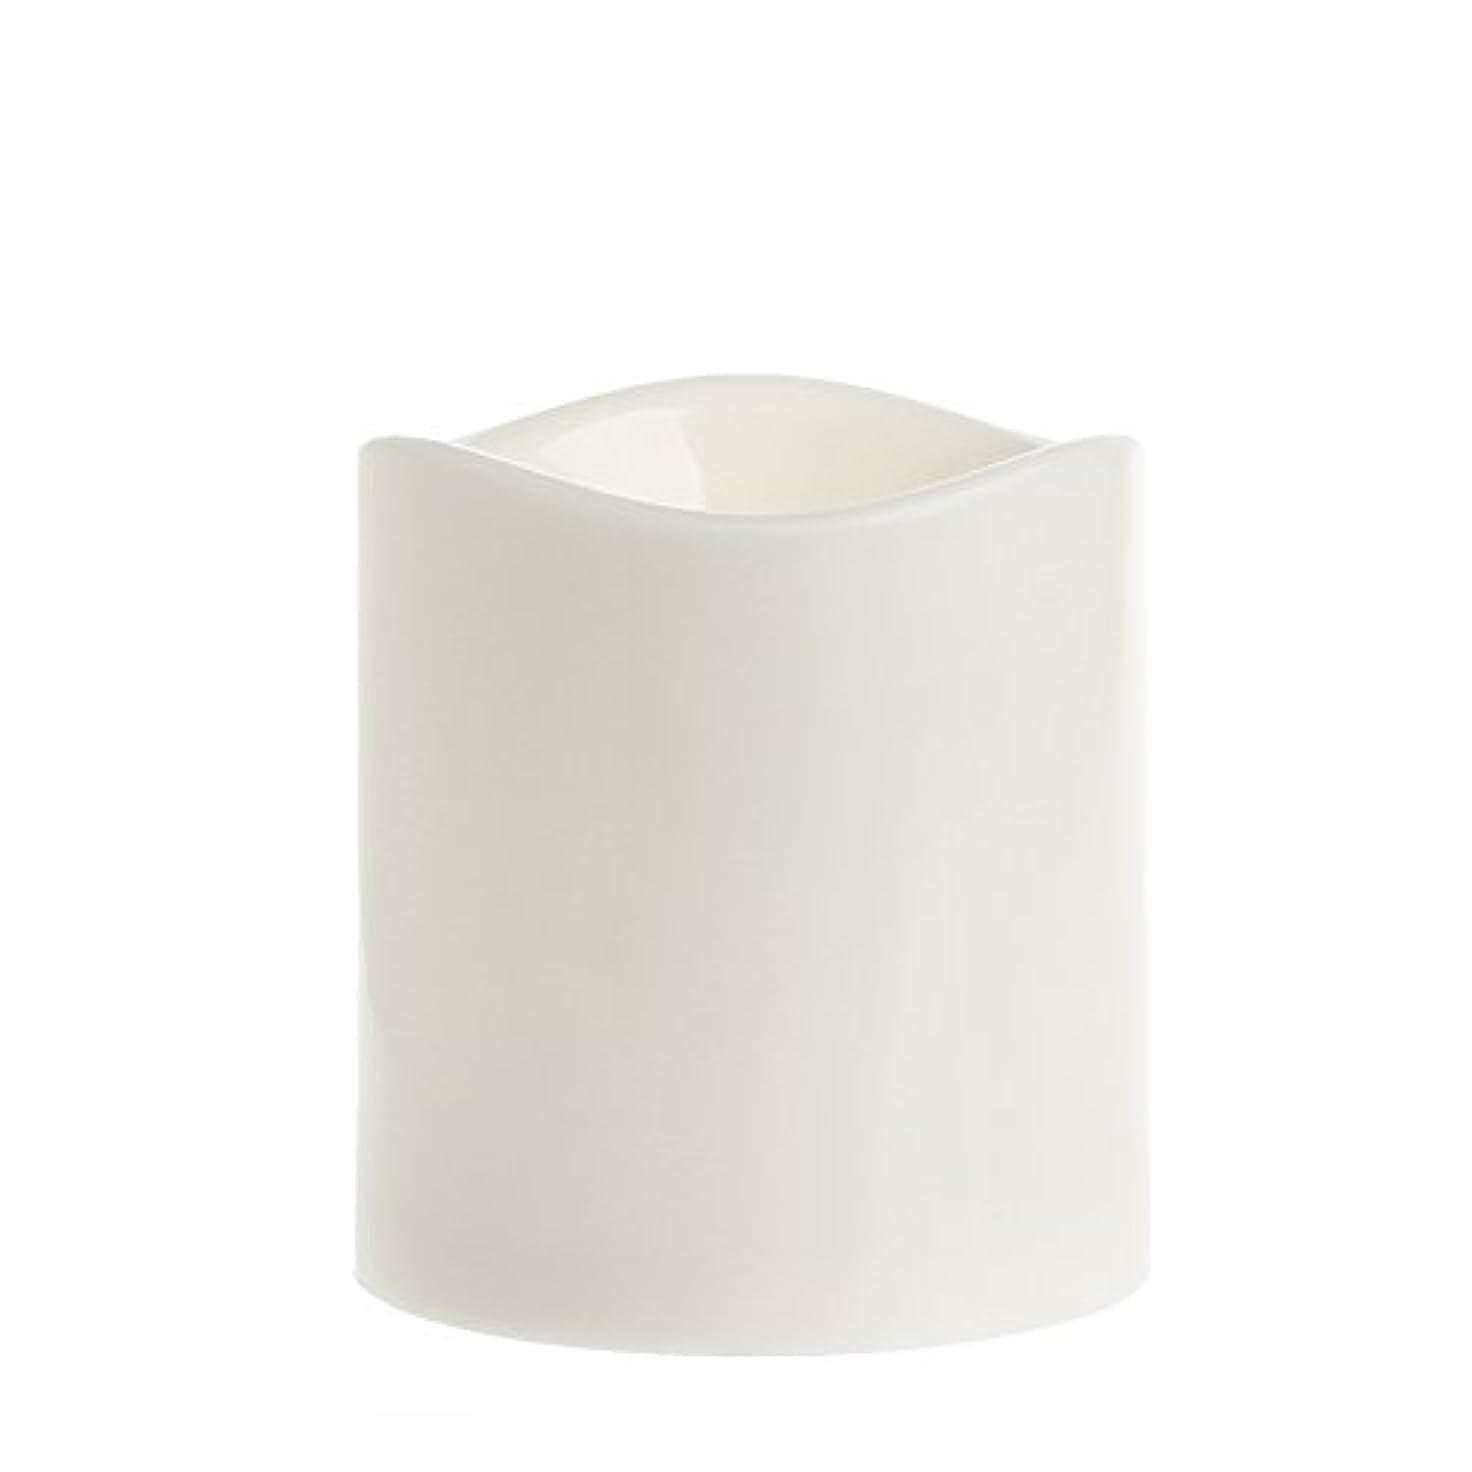 SimpleLifeロマンチックFlameless LED電子キャンドルライトウェディング香りワックスホームインテリア